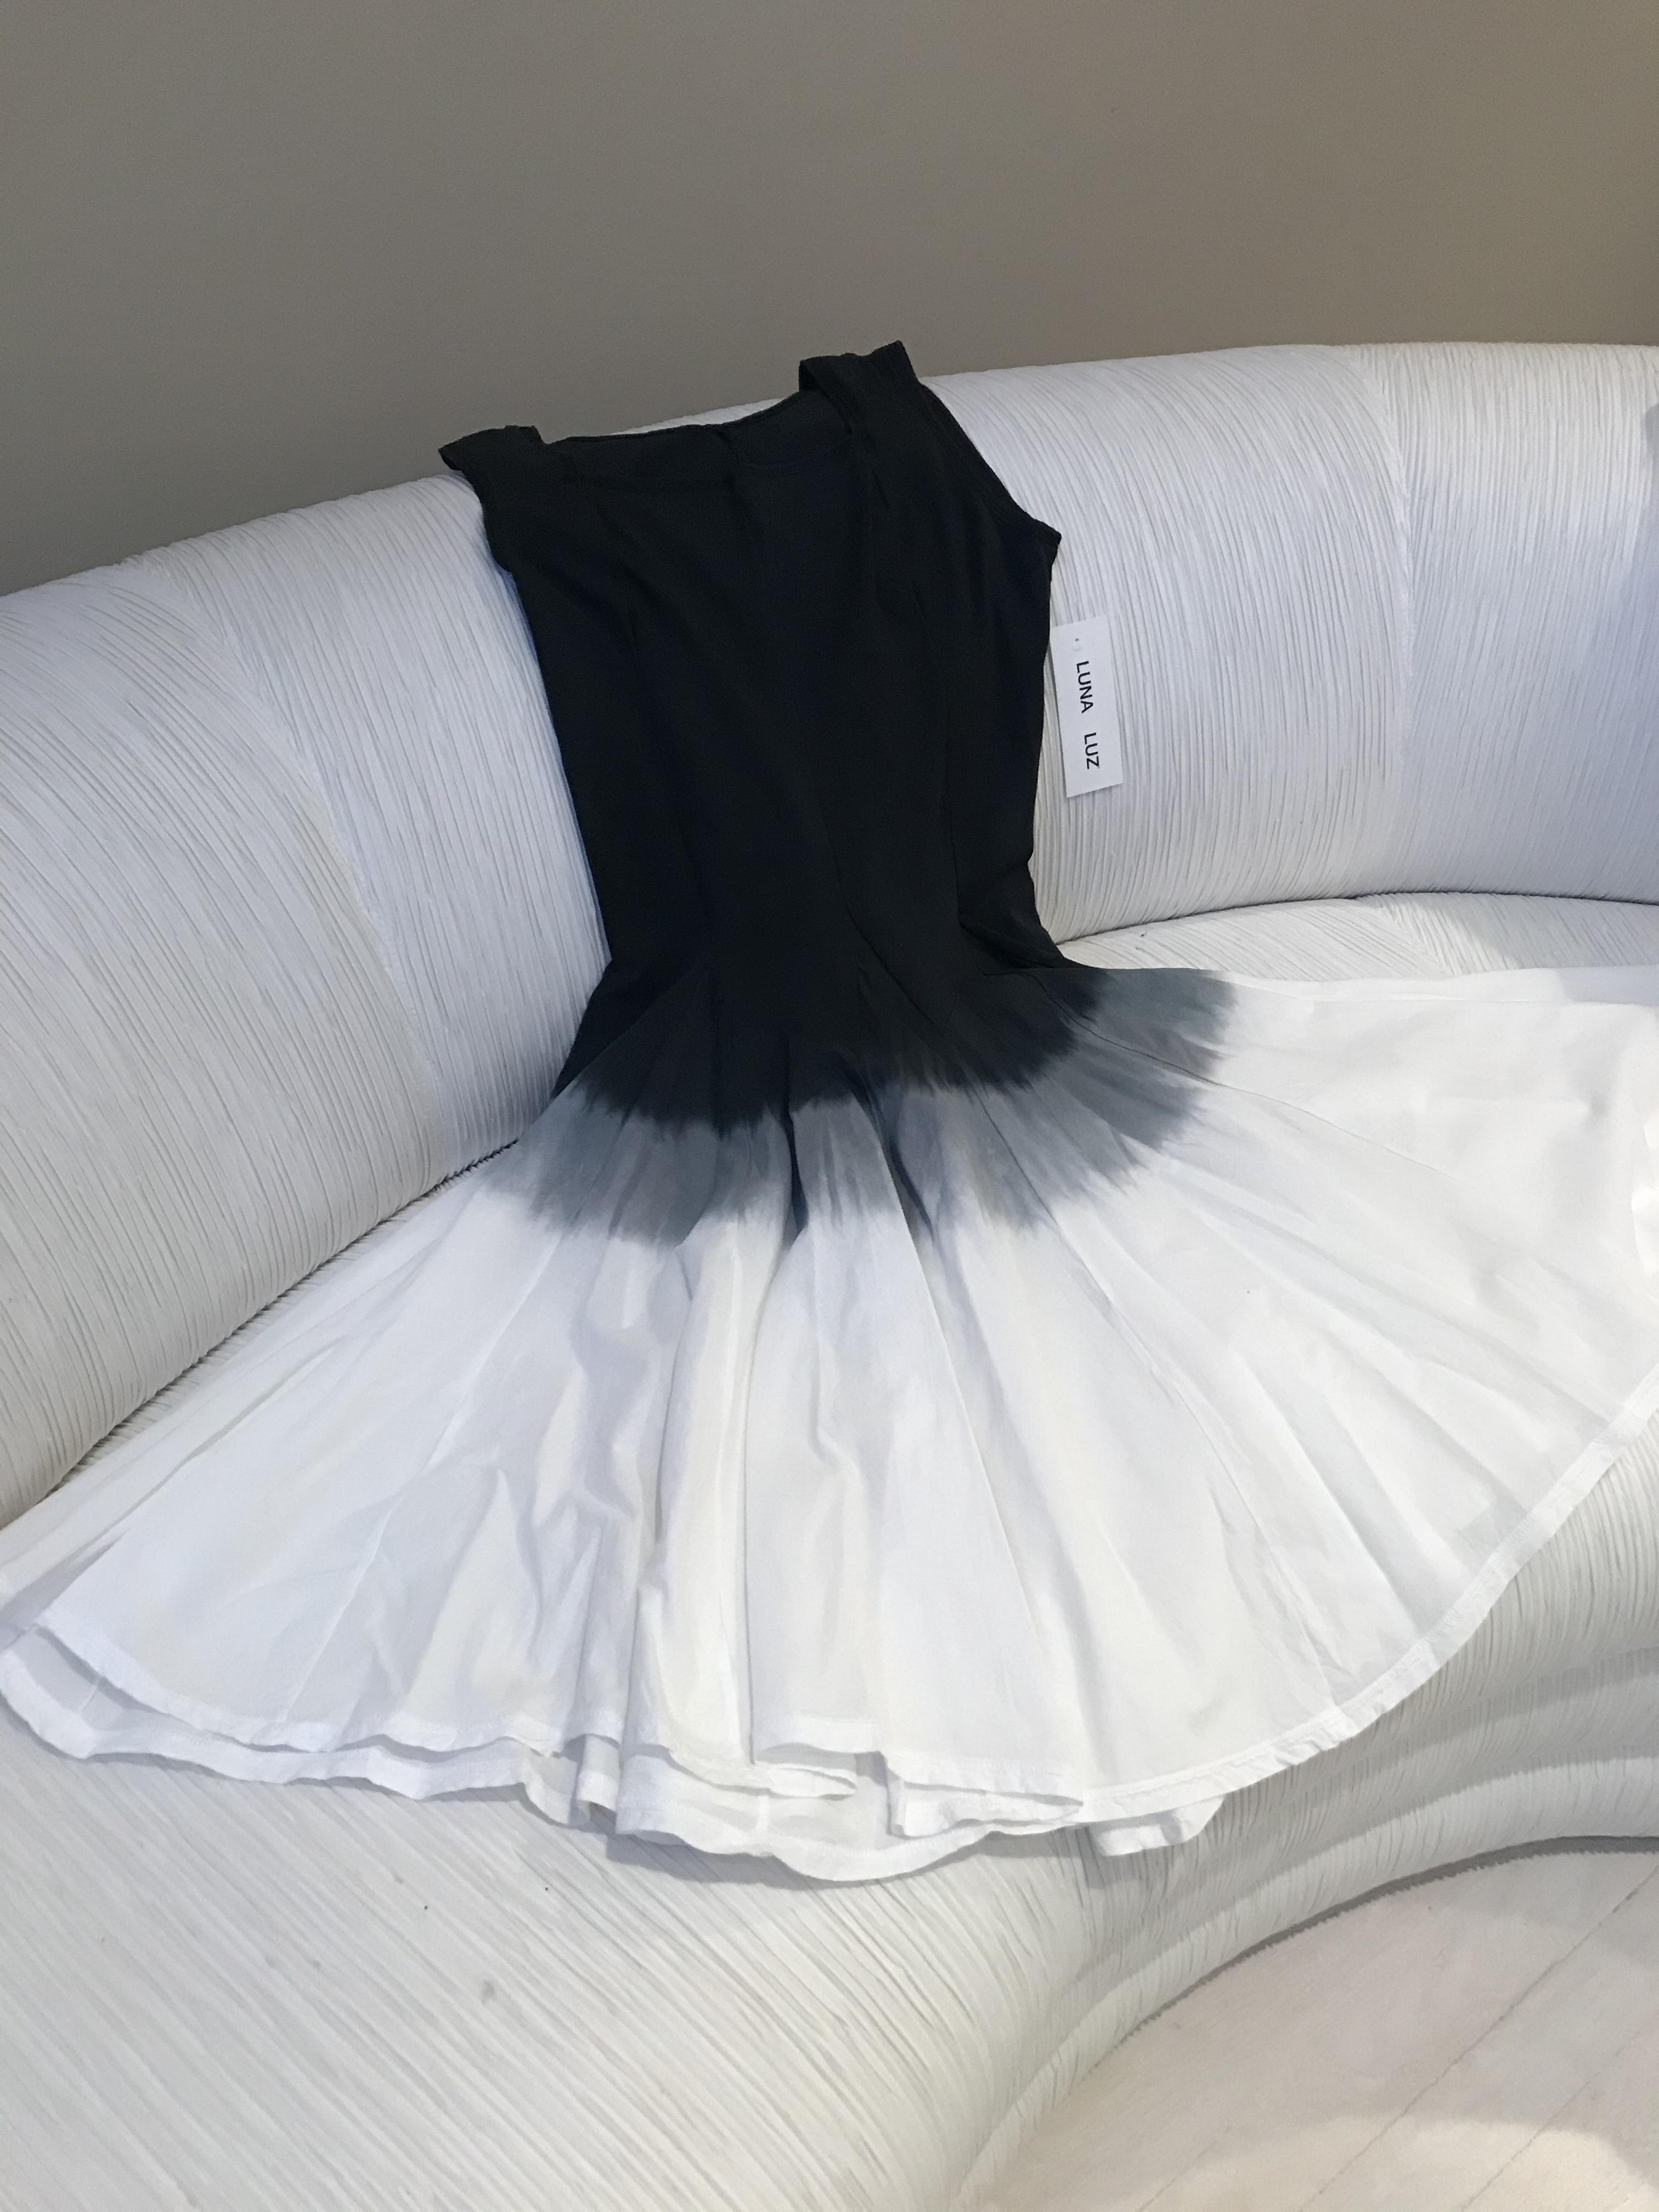 Luna Luz: Square Neck Godet Dyed Tank Dress (Ships Immed in: Black Ombre!) LL_5533_blk_ombre